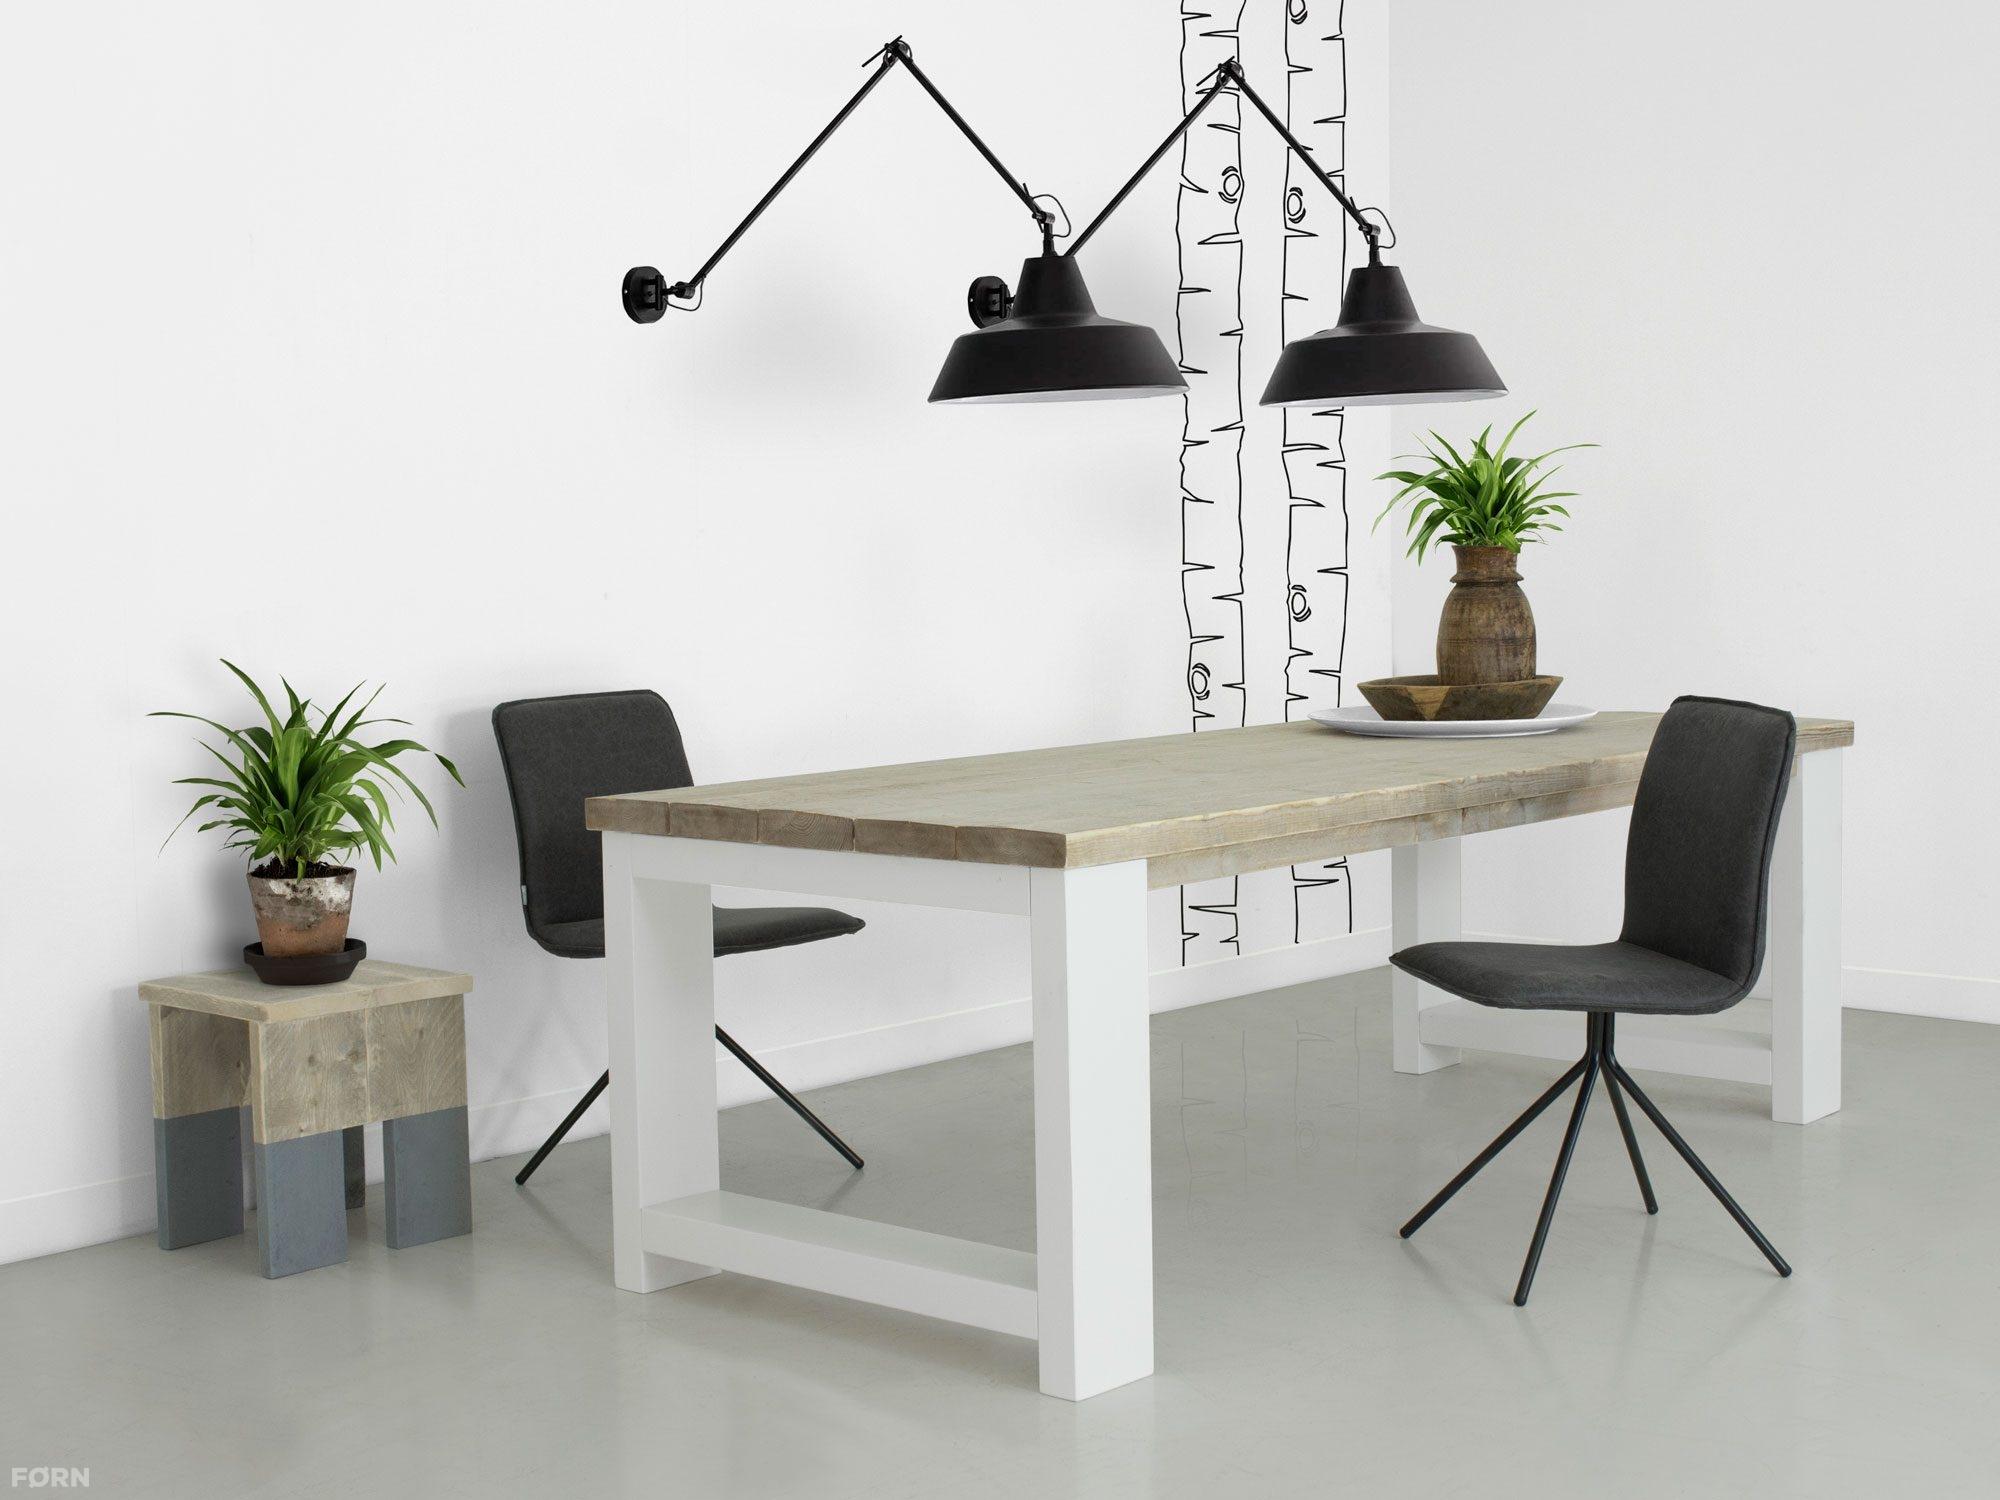 Steigerhouten tafel met dikke planken millau tafels met for Goedkope industriele eetkamerstoelen